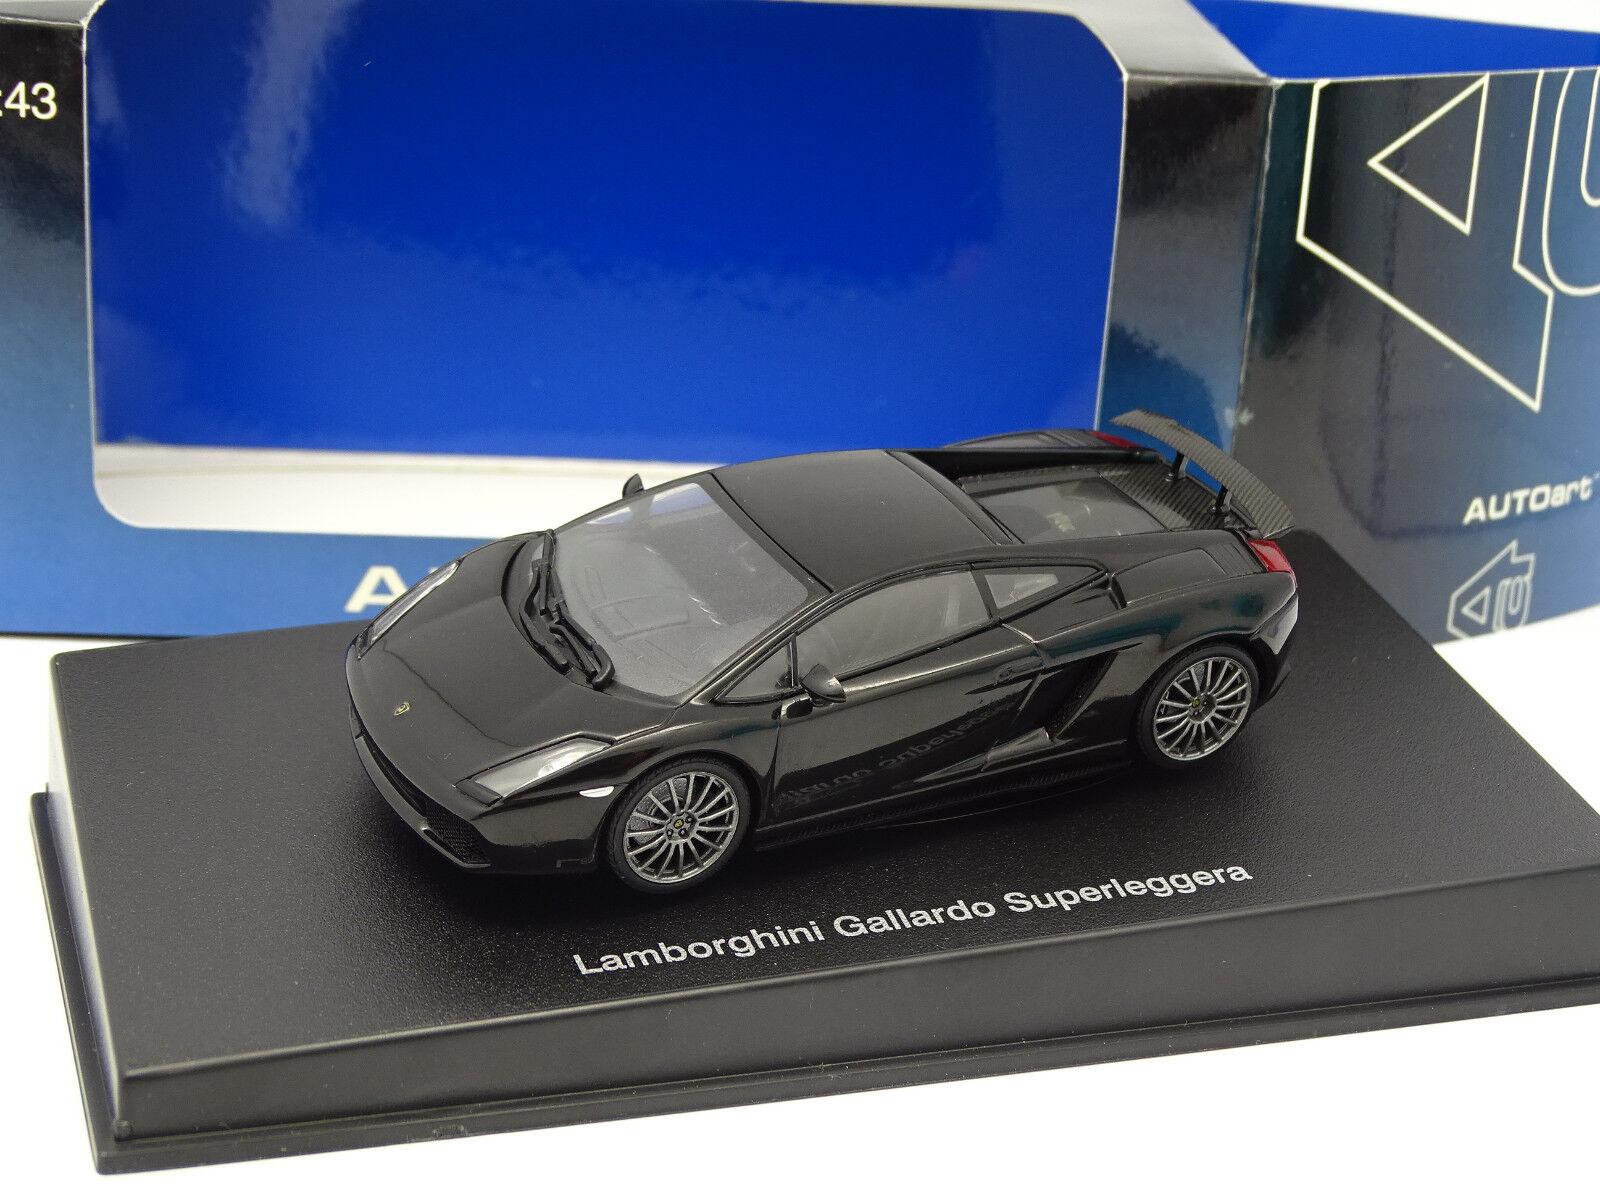 Auto Art Art Art 1 43 - Lamborghini Gallardo Superleggera 7c008a